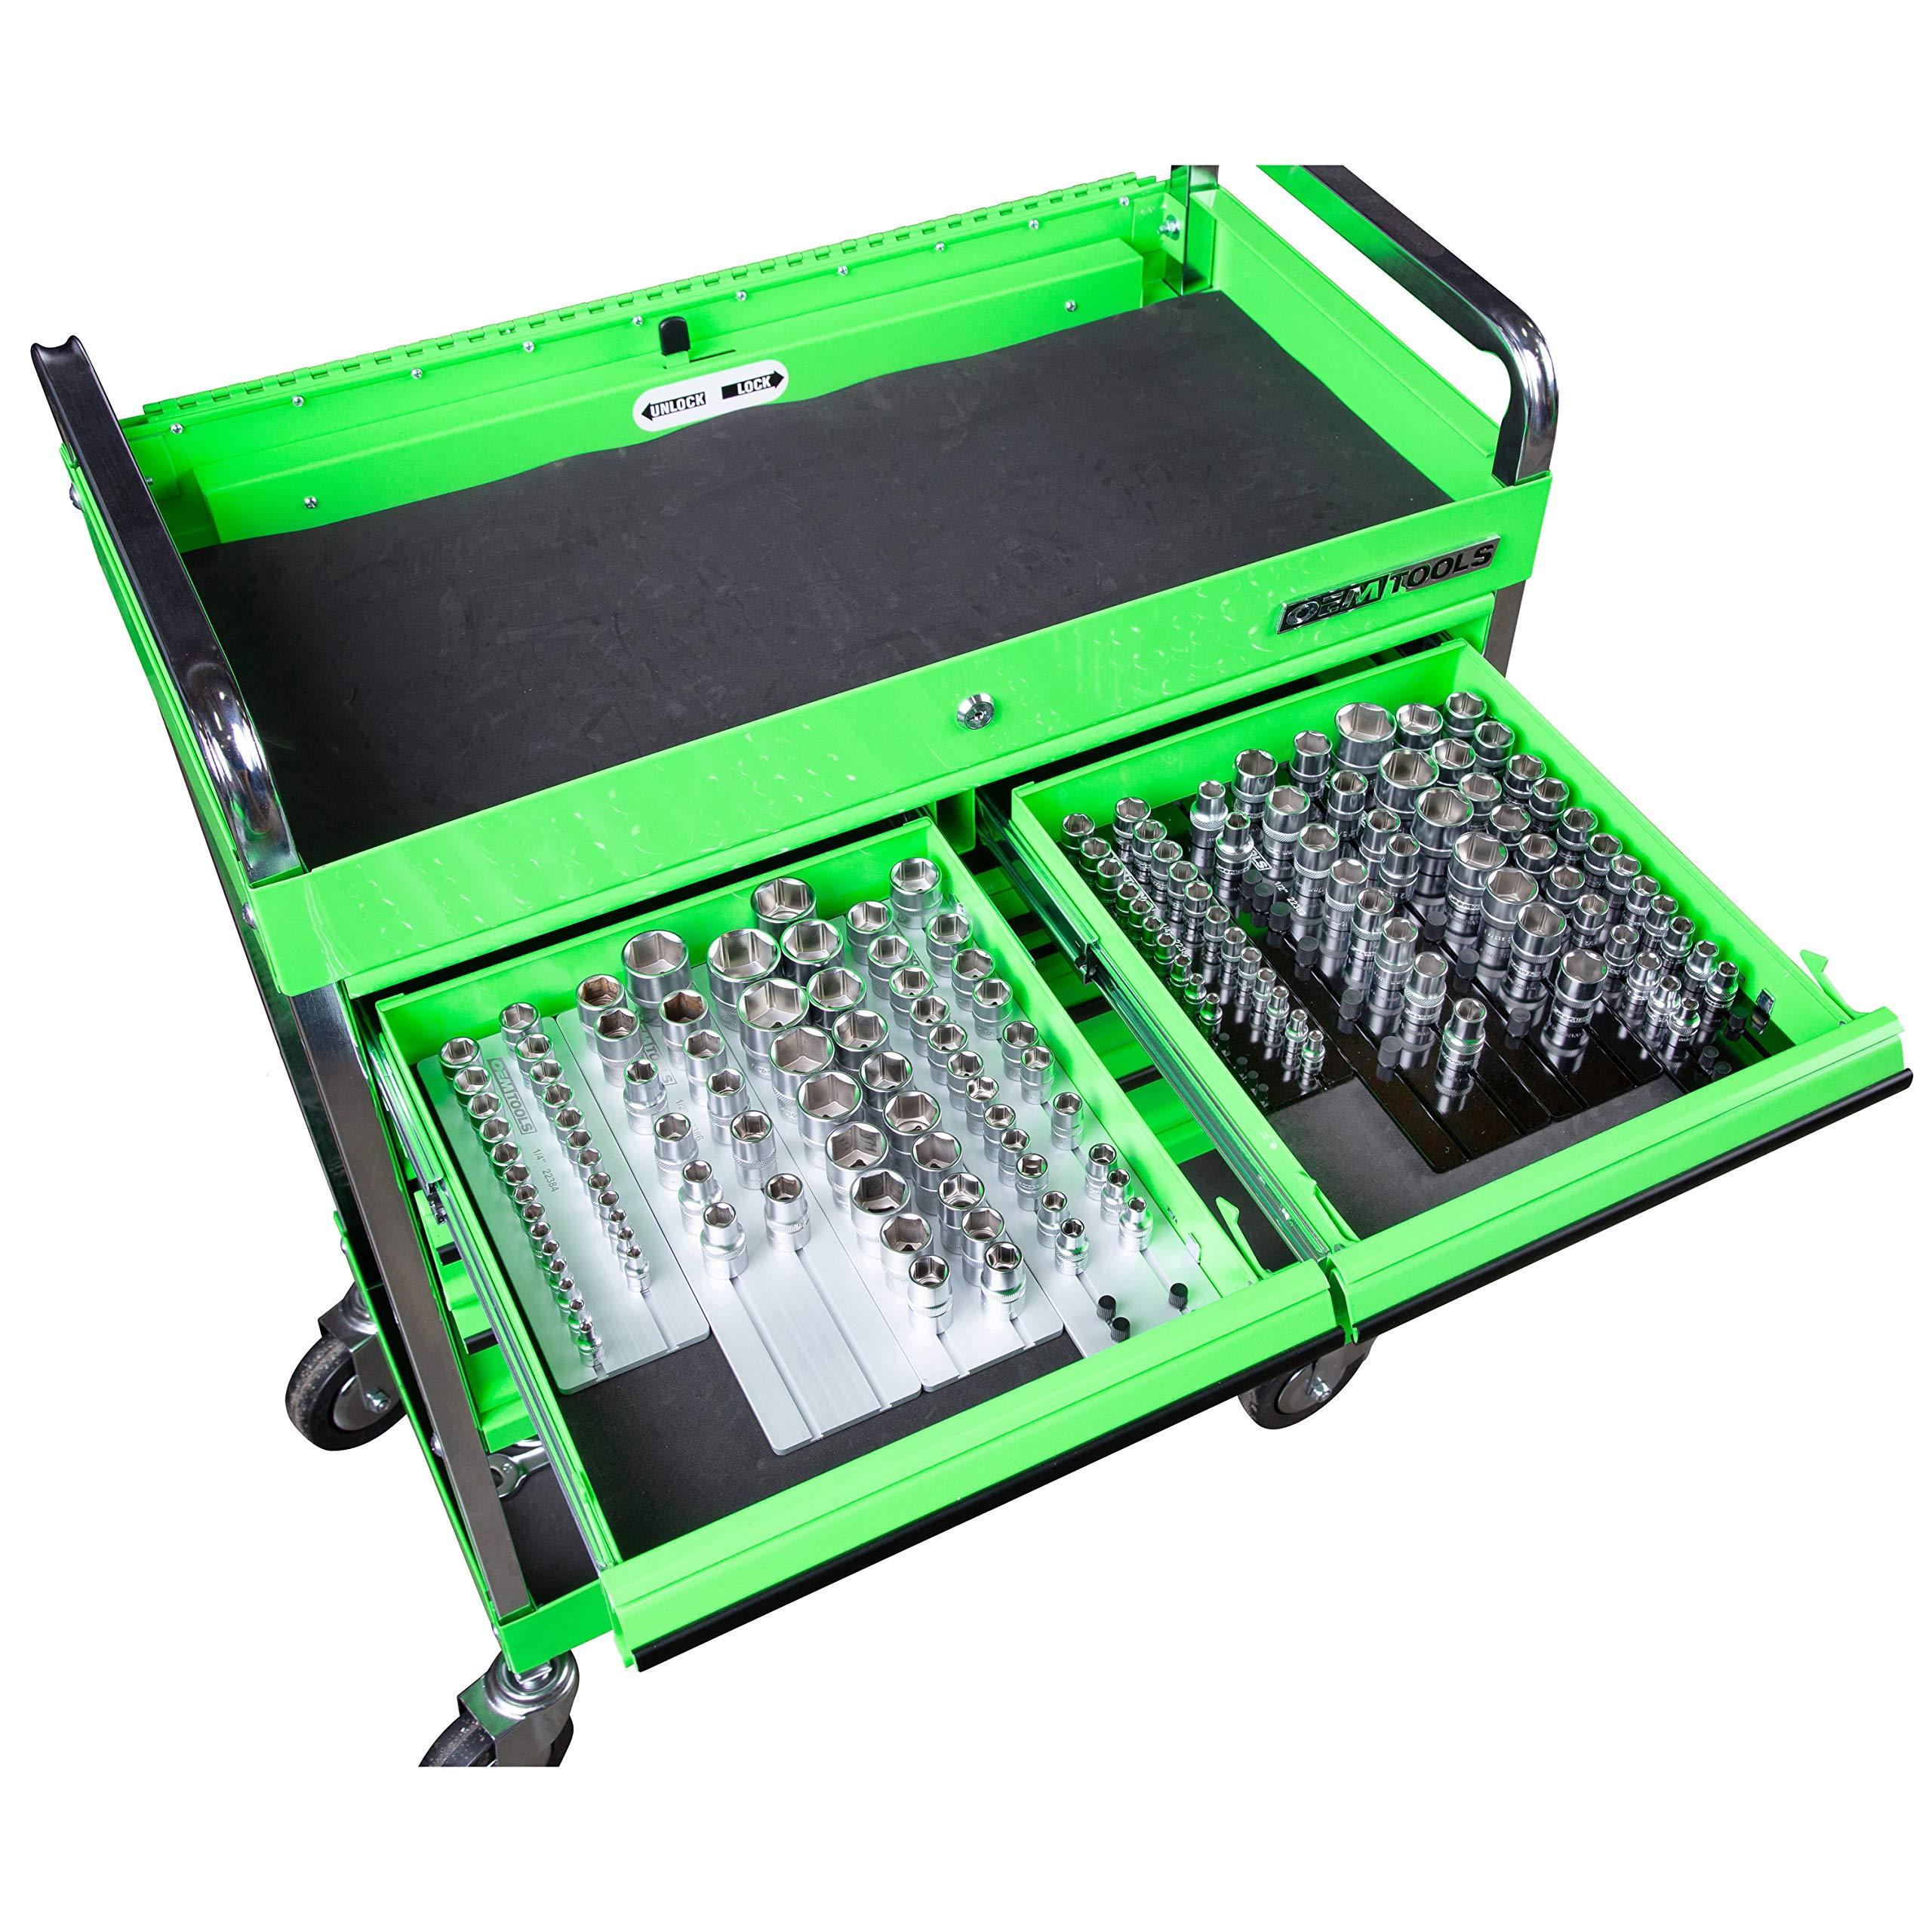 OEMTOOLS 22388 8 Piece Aluminum Socket Tray Set by OEMTOOLS (Image #4)